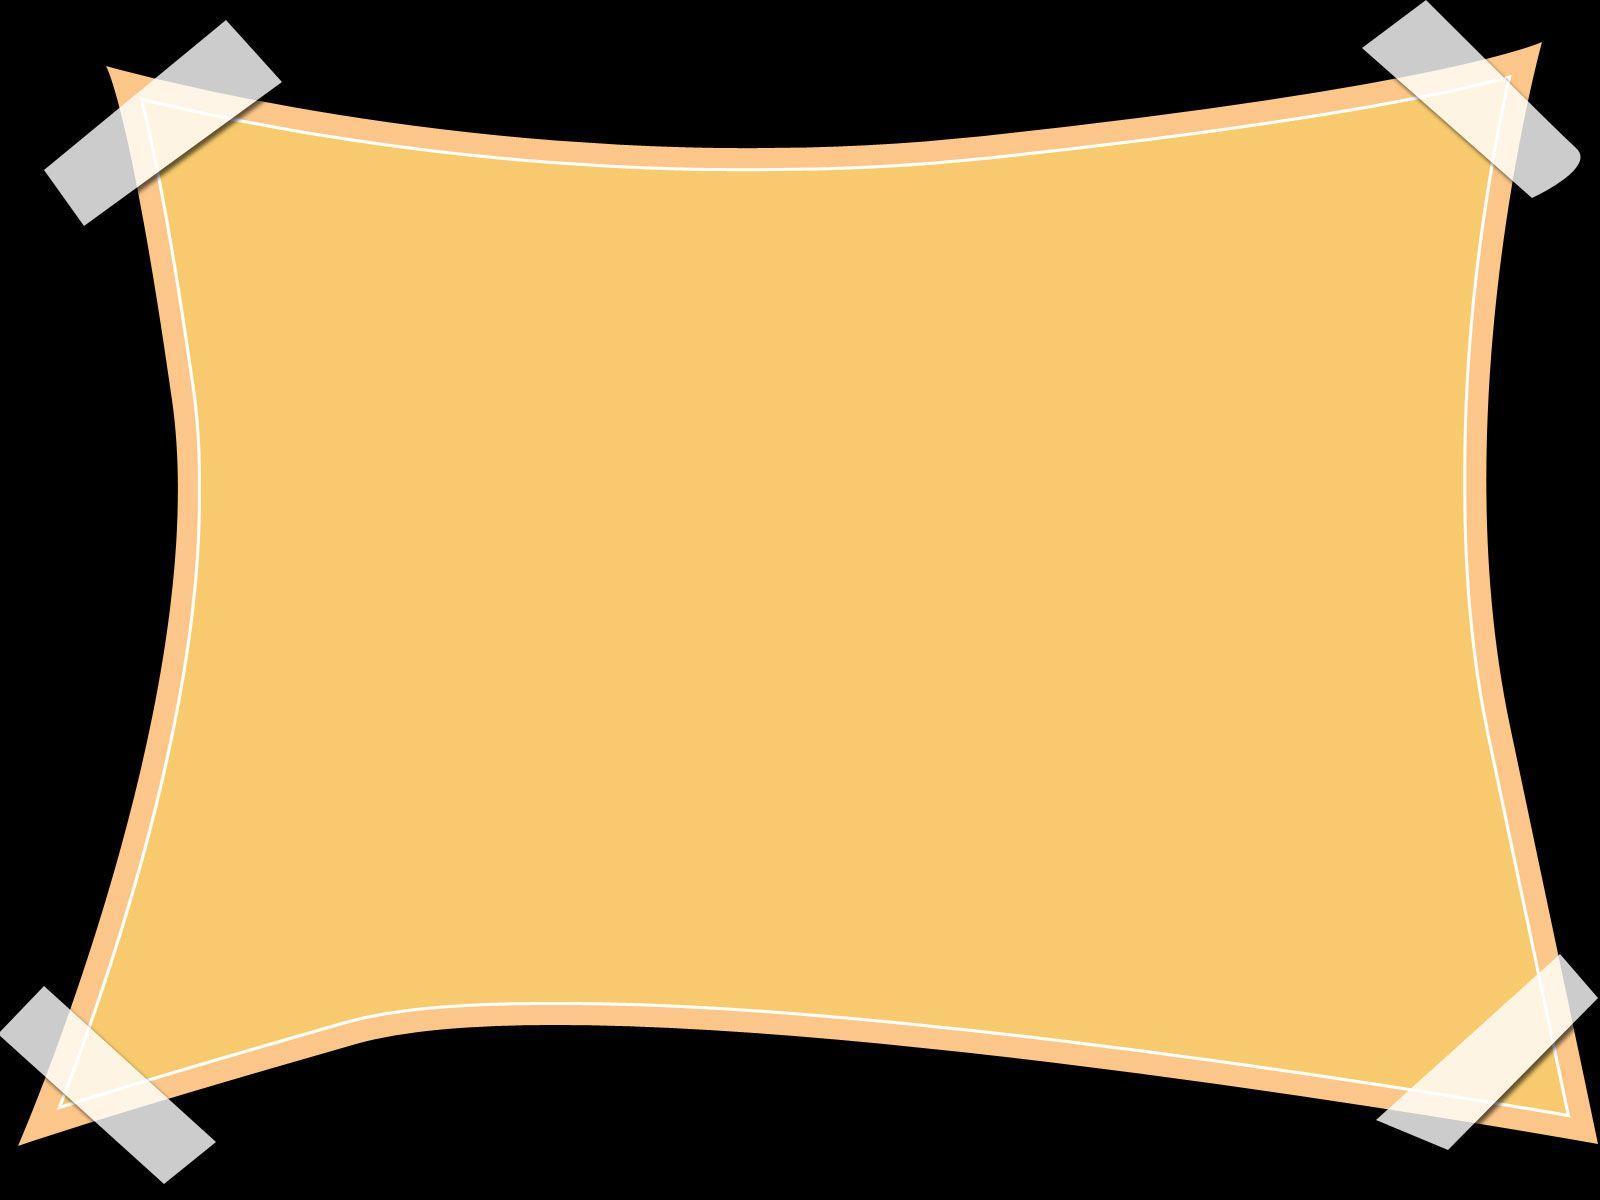 Gambar Backgrounds Simple Untuk Powerpoint - Wallpaper Cave